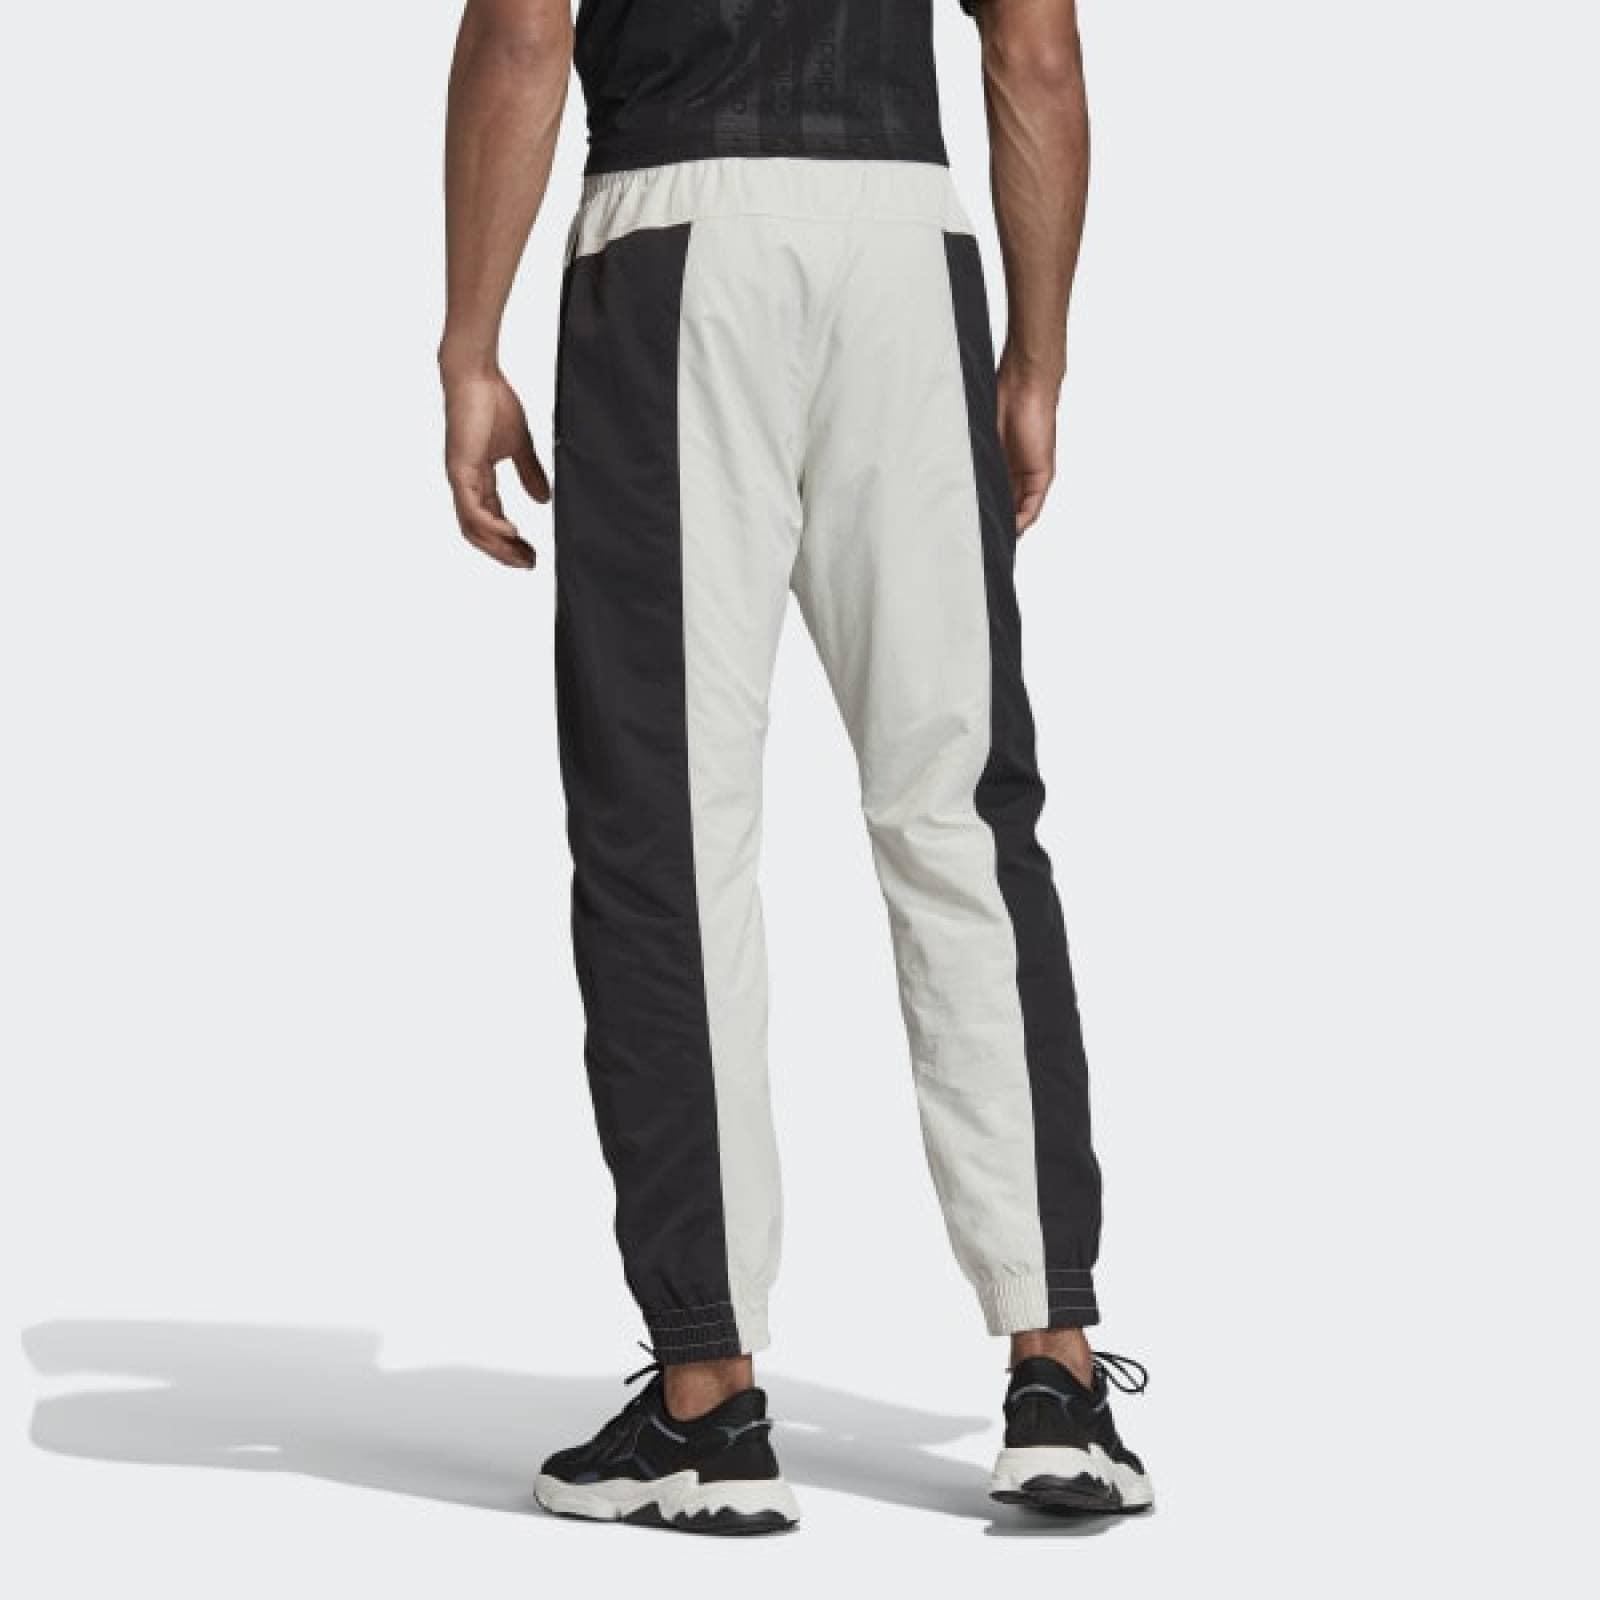 Pantalon Adidas Ryv Deportivos Hombre Urbano